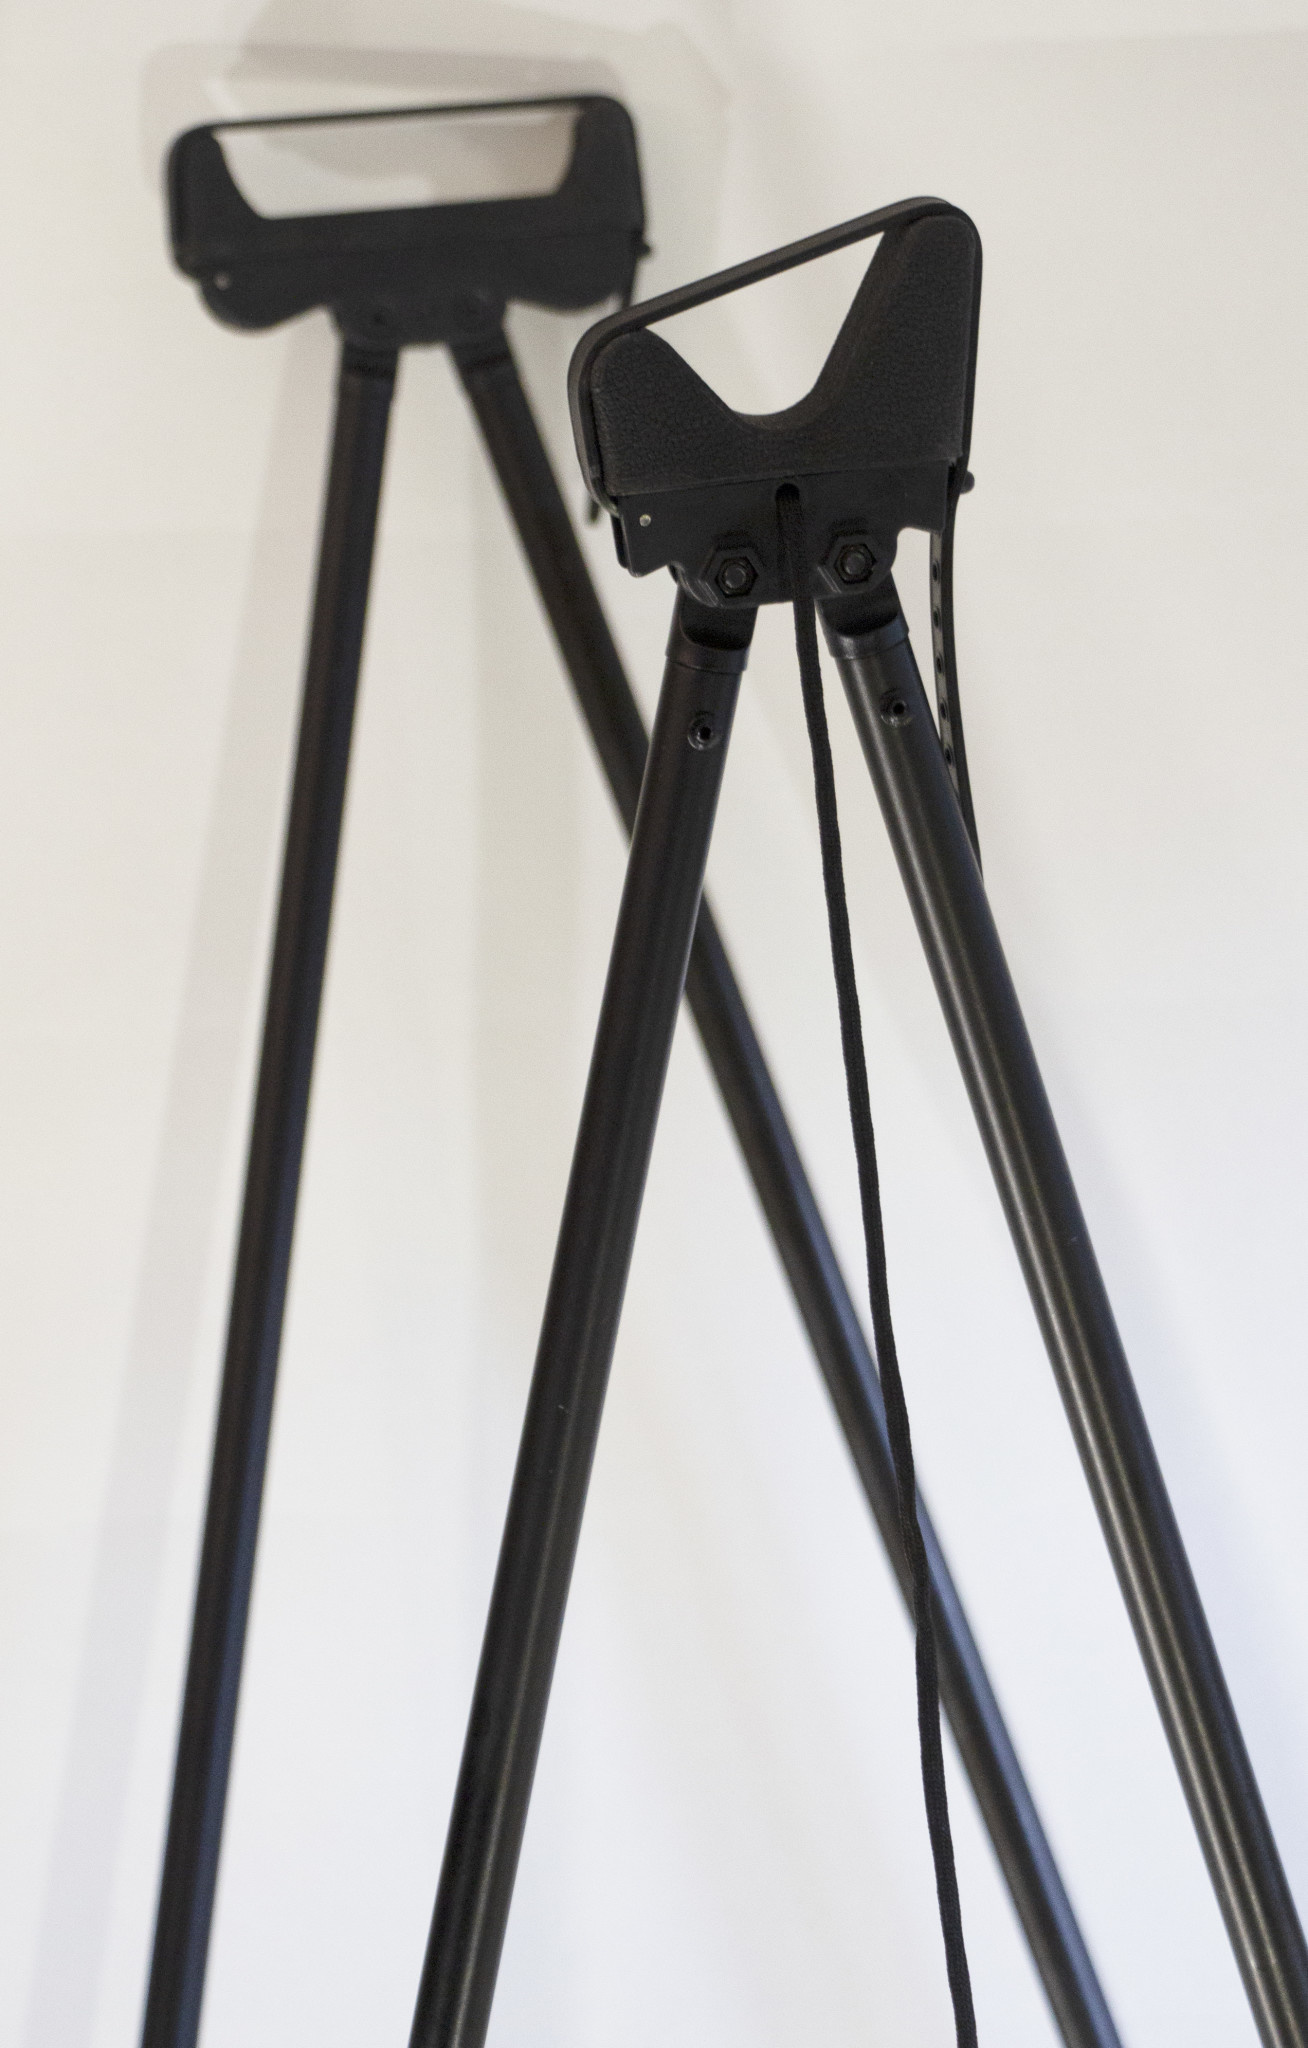 Mjoelner Schießstock 4-Bein Fenris II, Schwarz, Alu